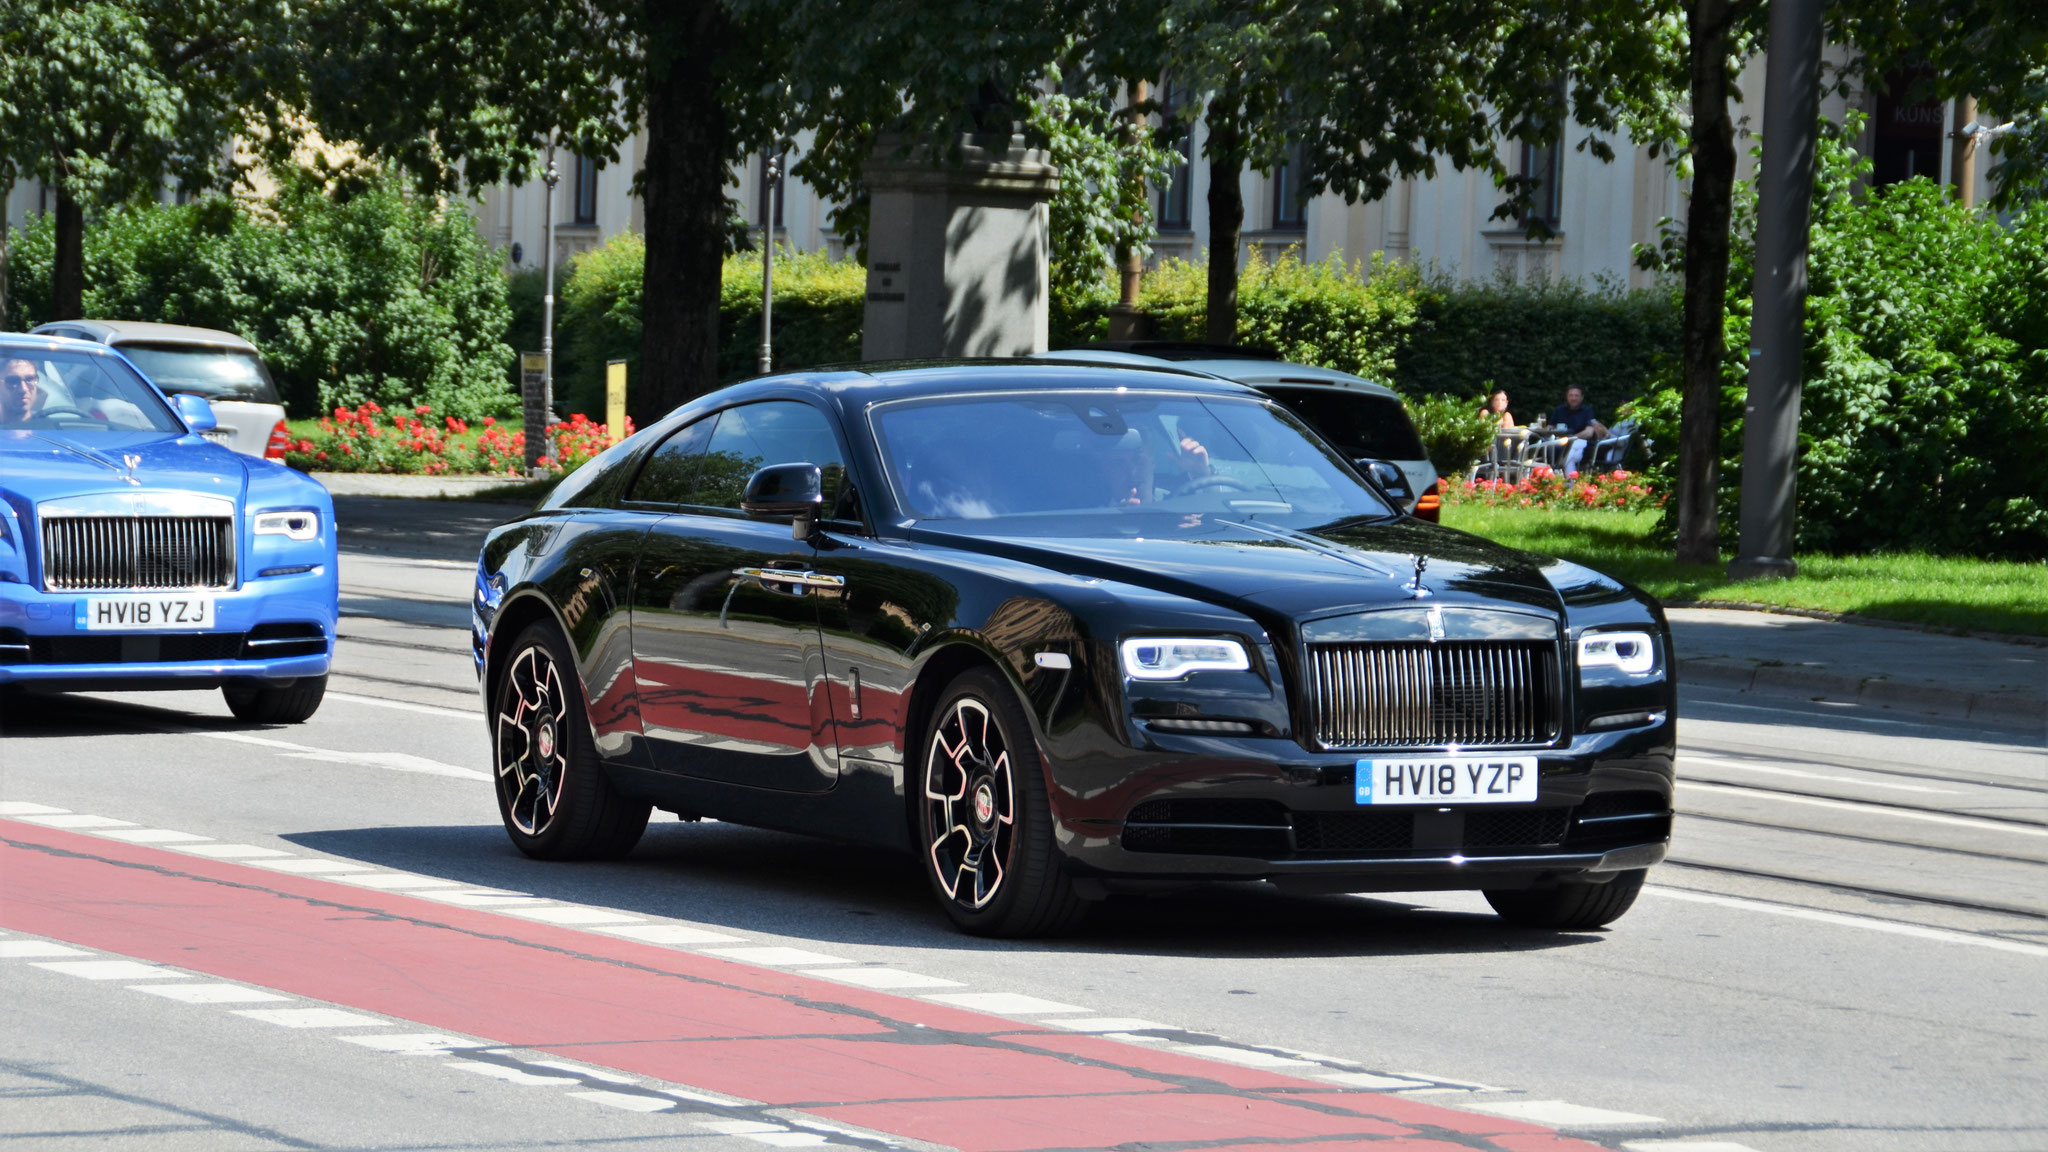 Rolls Royce Wraith Black Badge - HV18-YZP (GB)